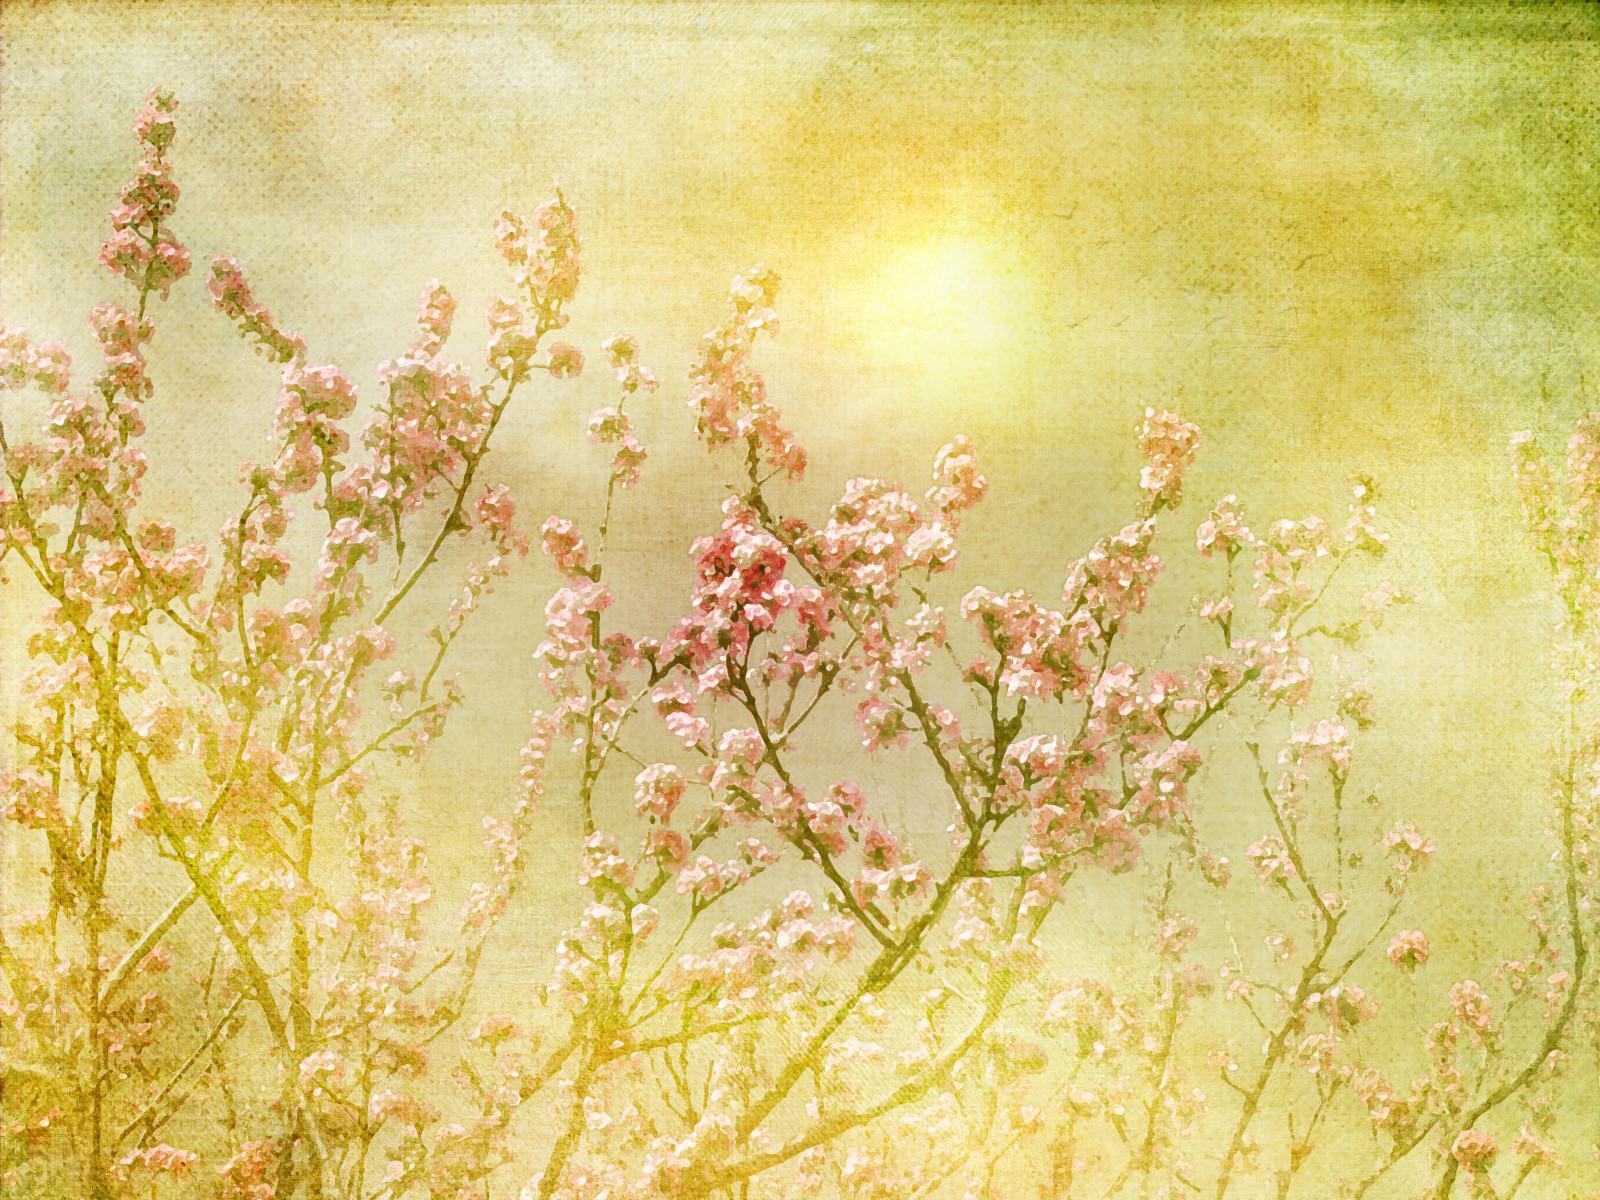 fond d 39 cran lumi re du soleil herbe branche matin texture fleur rose printemps sakura. Black Bedroom Furniture Sets. Home Design Ideas